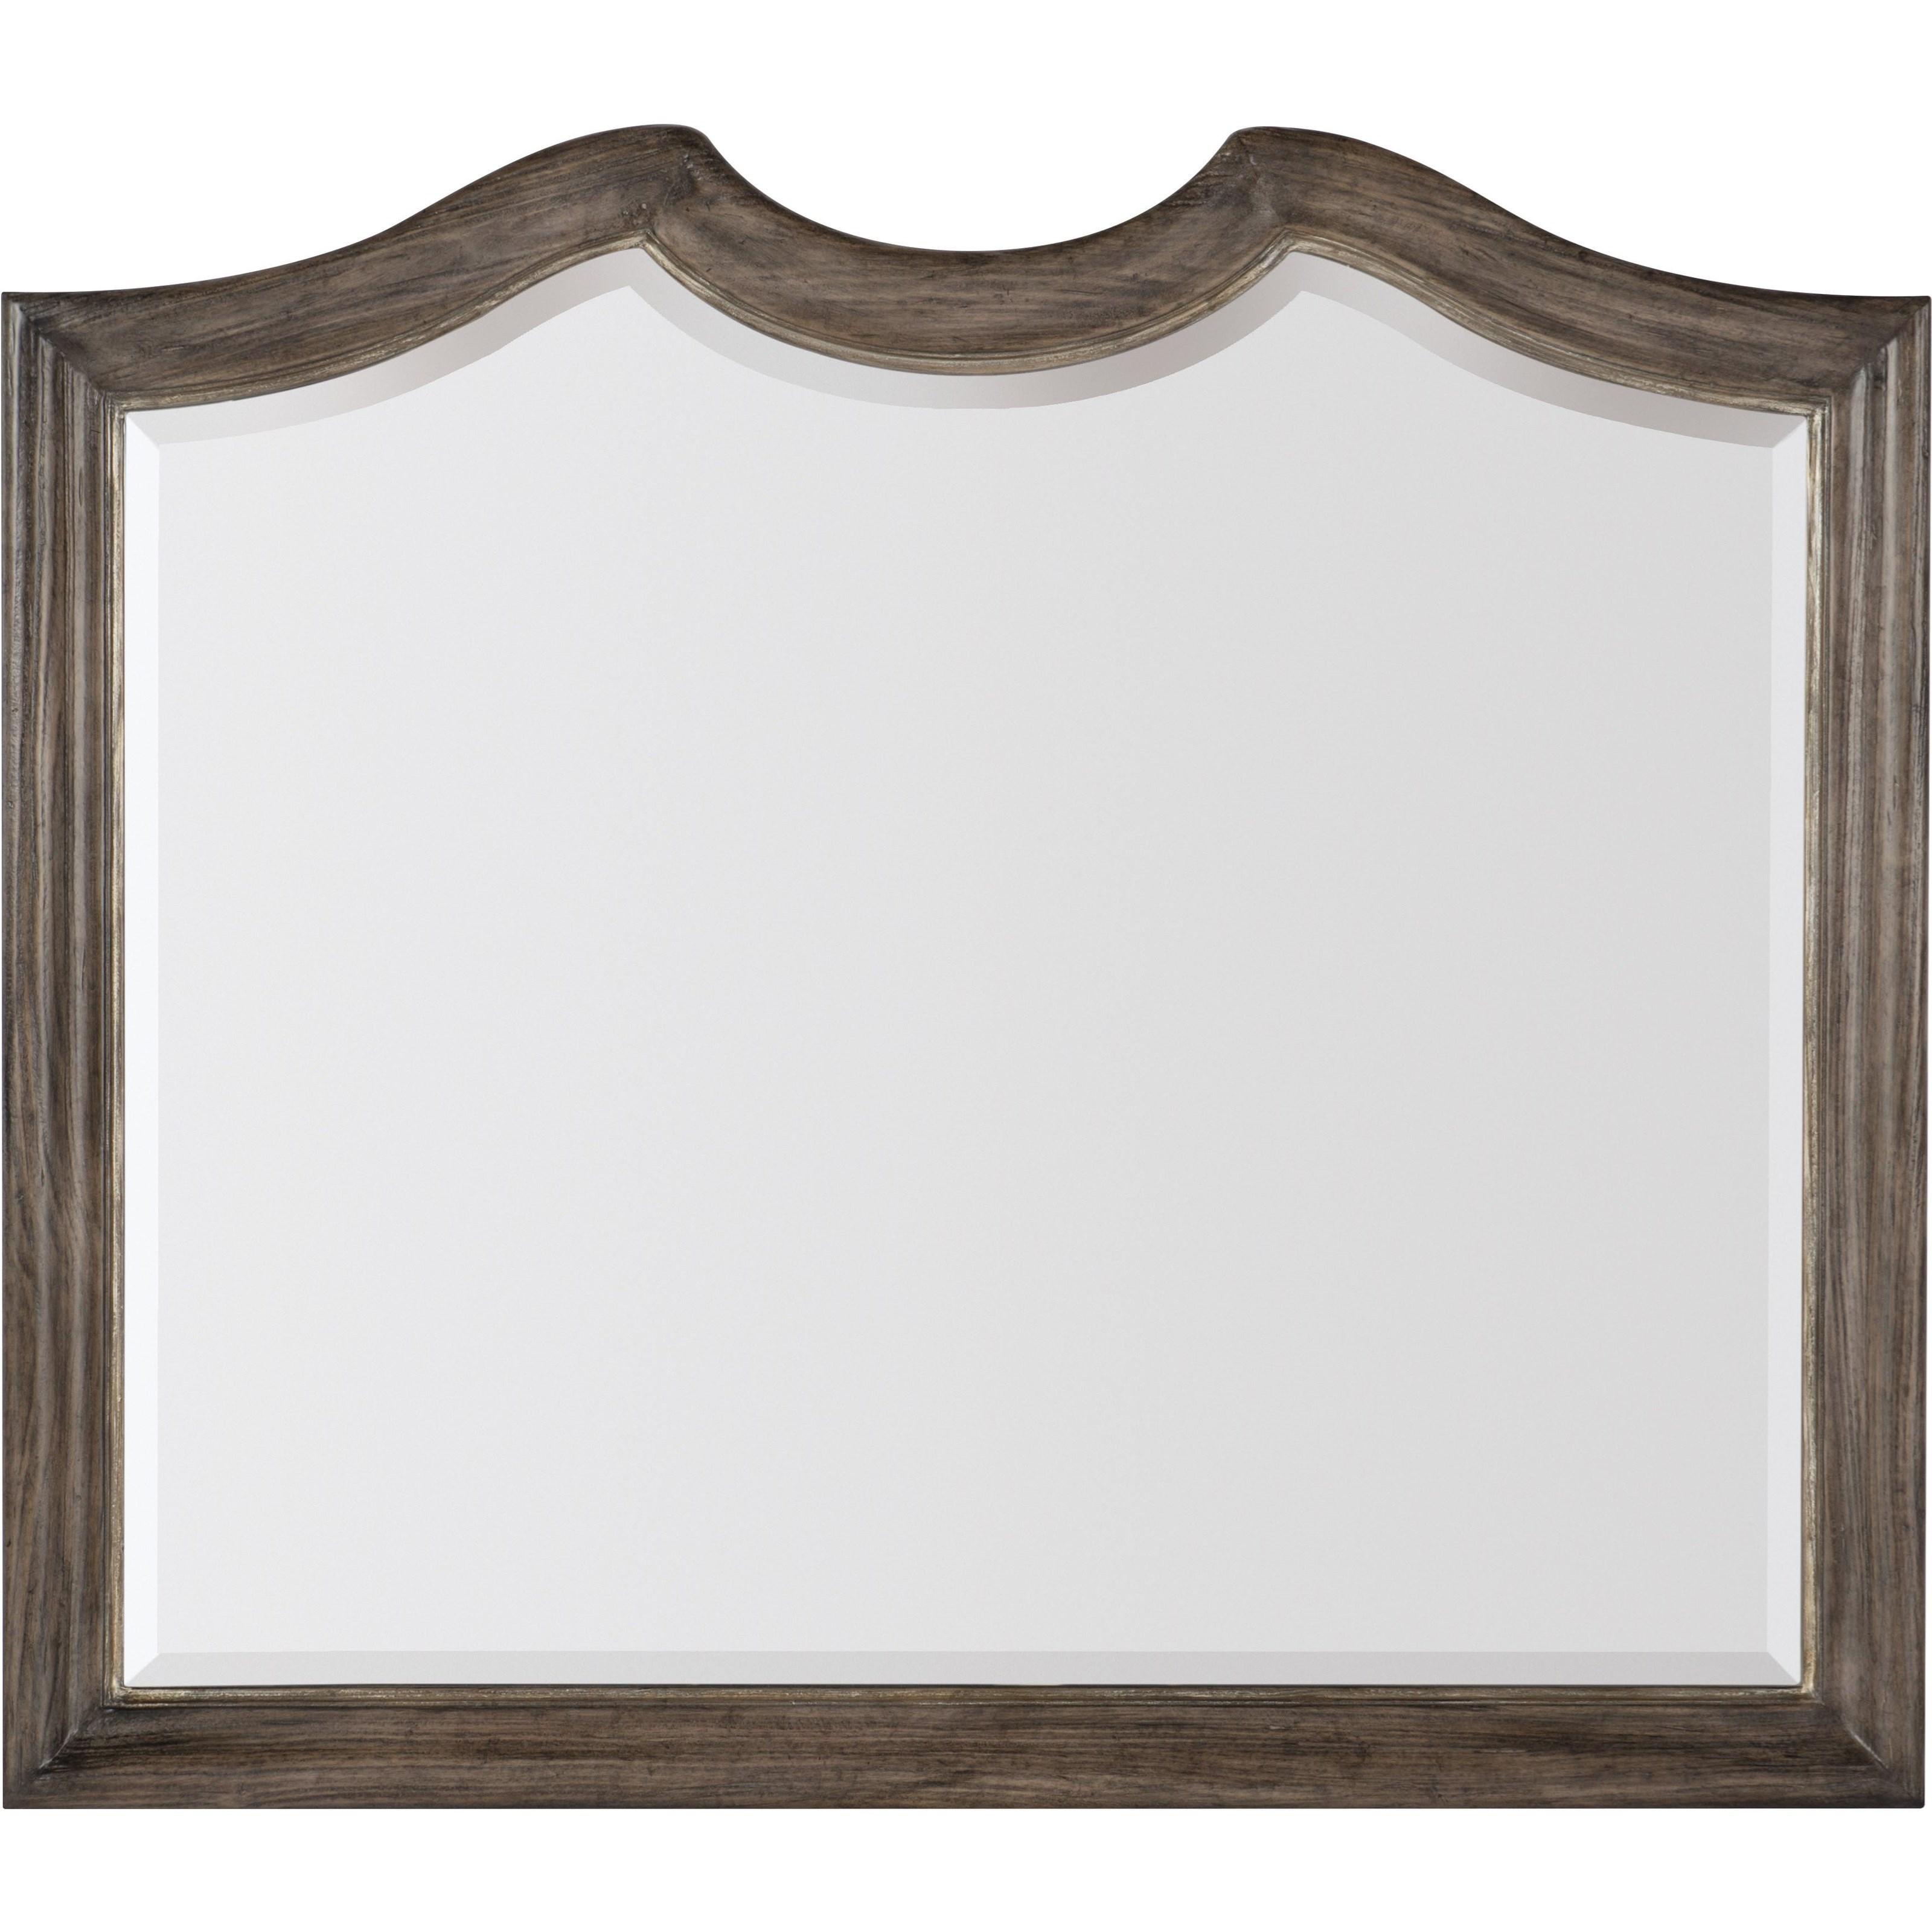 Woodlands Dresser Mirror by Hooker Furniture at Alison Craig Home Furnishings